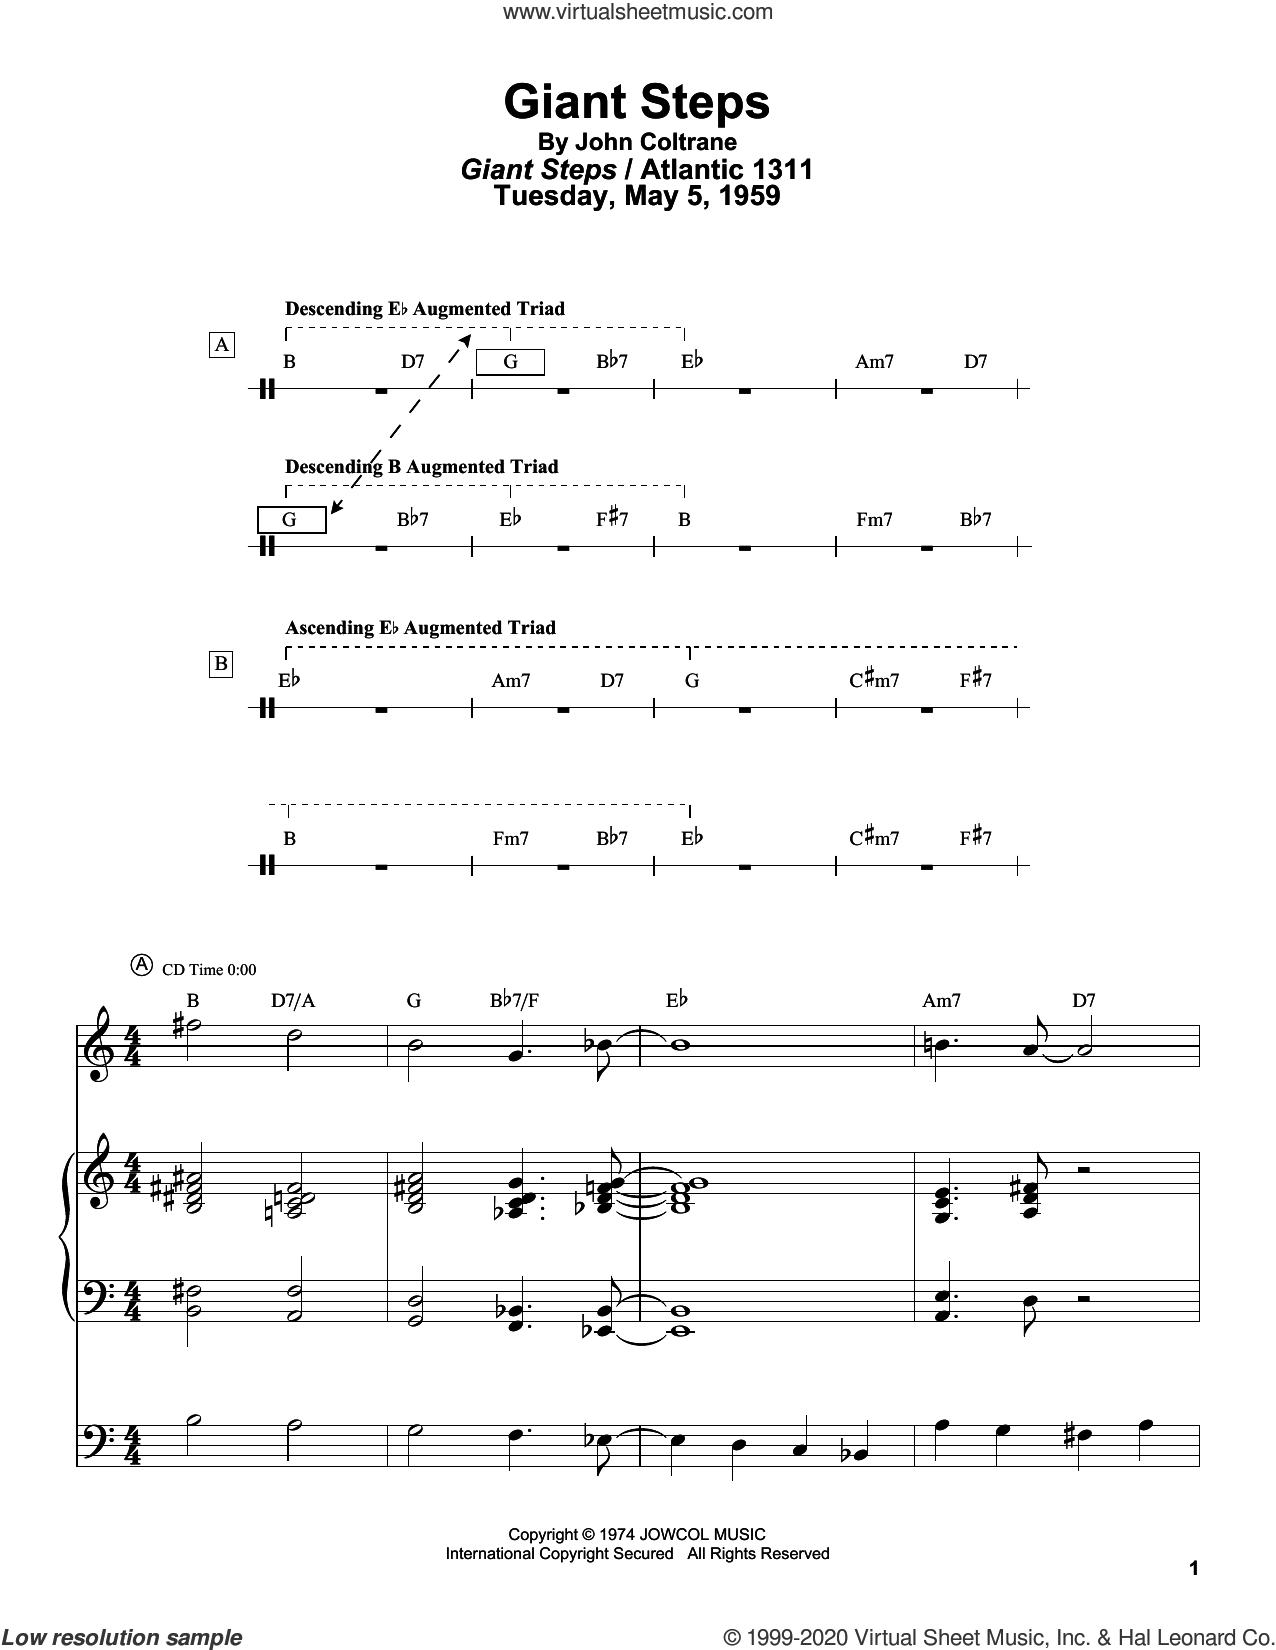 Giant Steps sheet music for tenor saxophone solo (transcription) by John Coltrane and Masaya Yamaguchi, intermediate tenor saxophone (transcription)